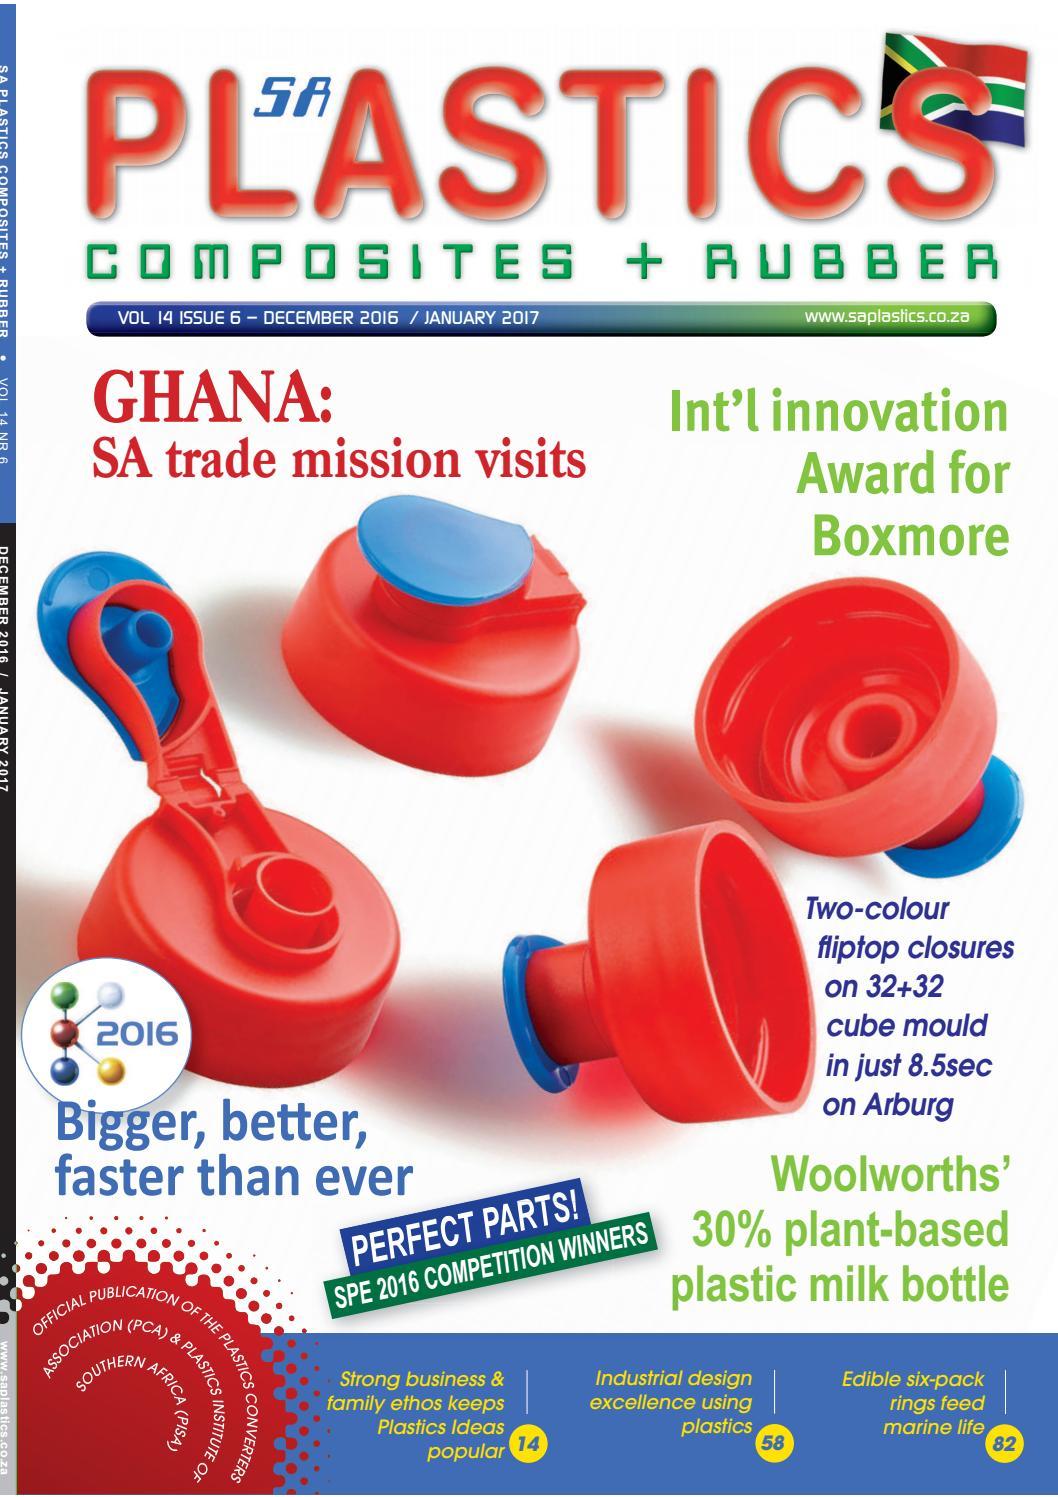 SA Plastics, Composites & Rubber - Dec 2016/Jan 2017 by SA